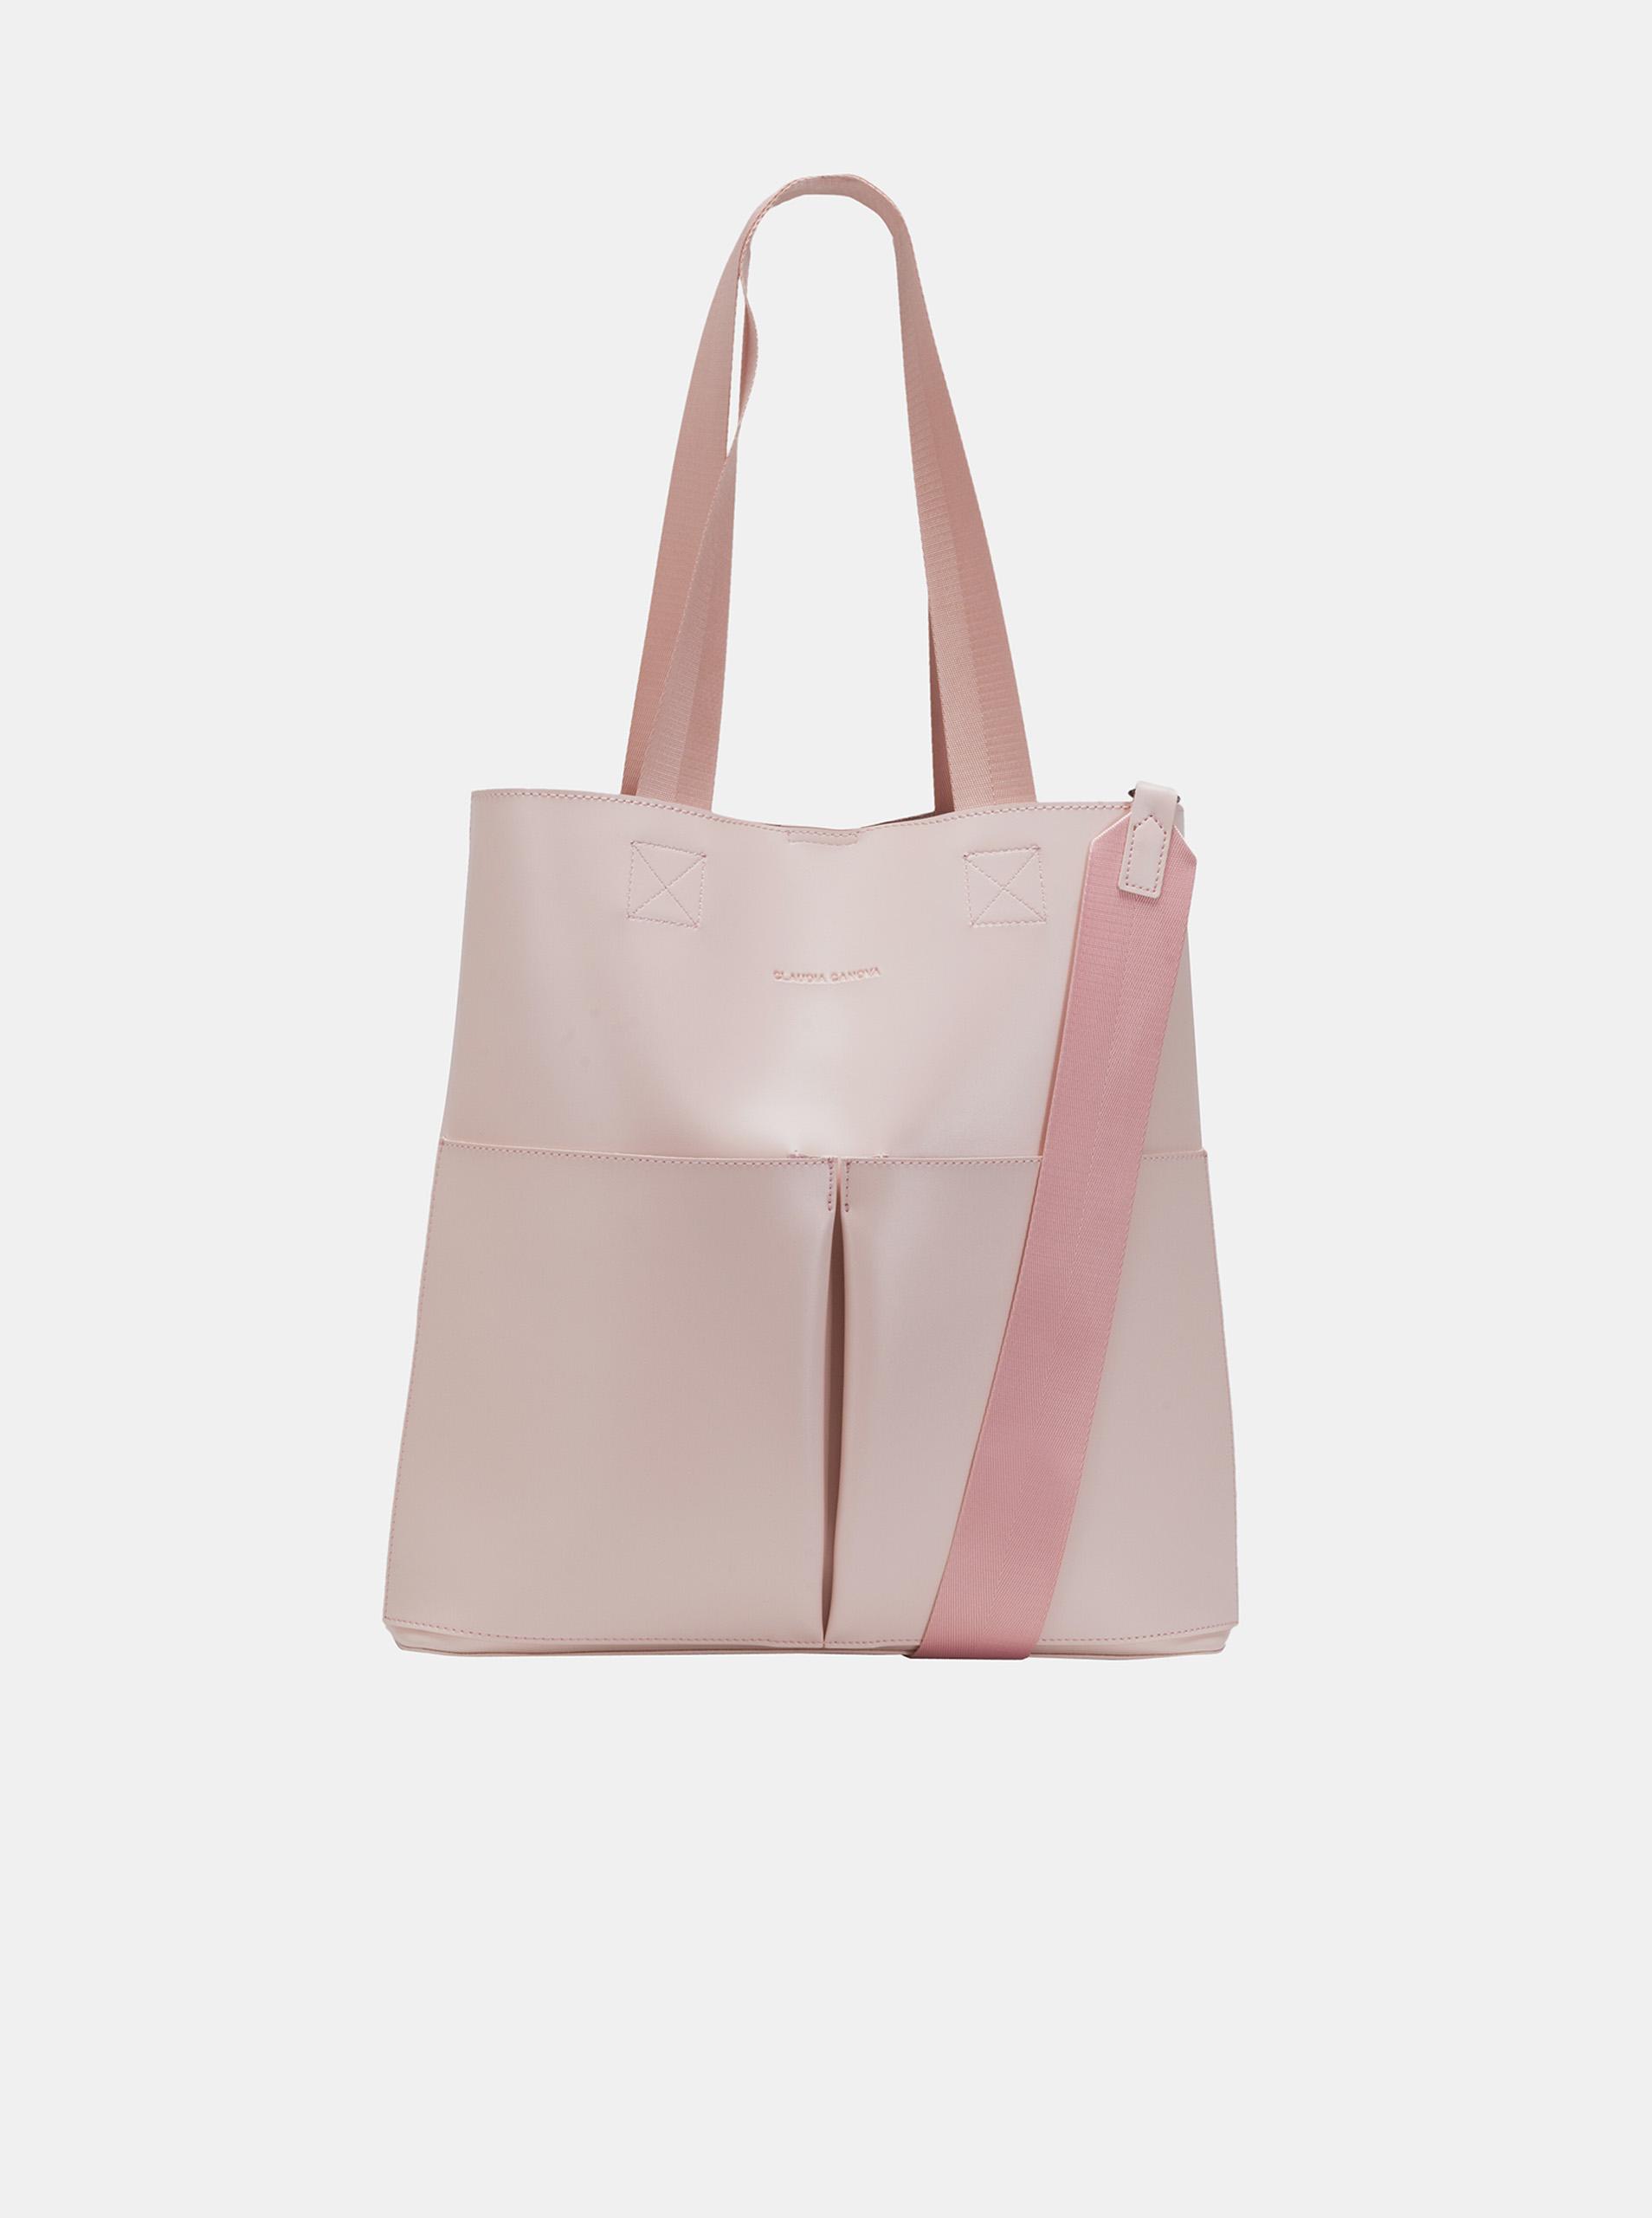 Claudia Canova pink handbag